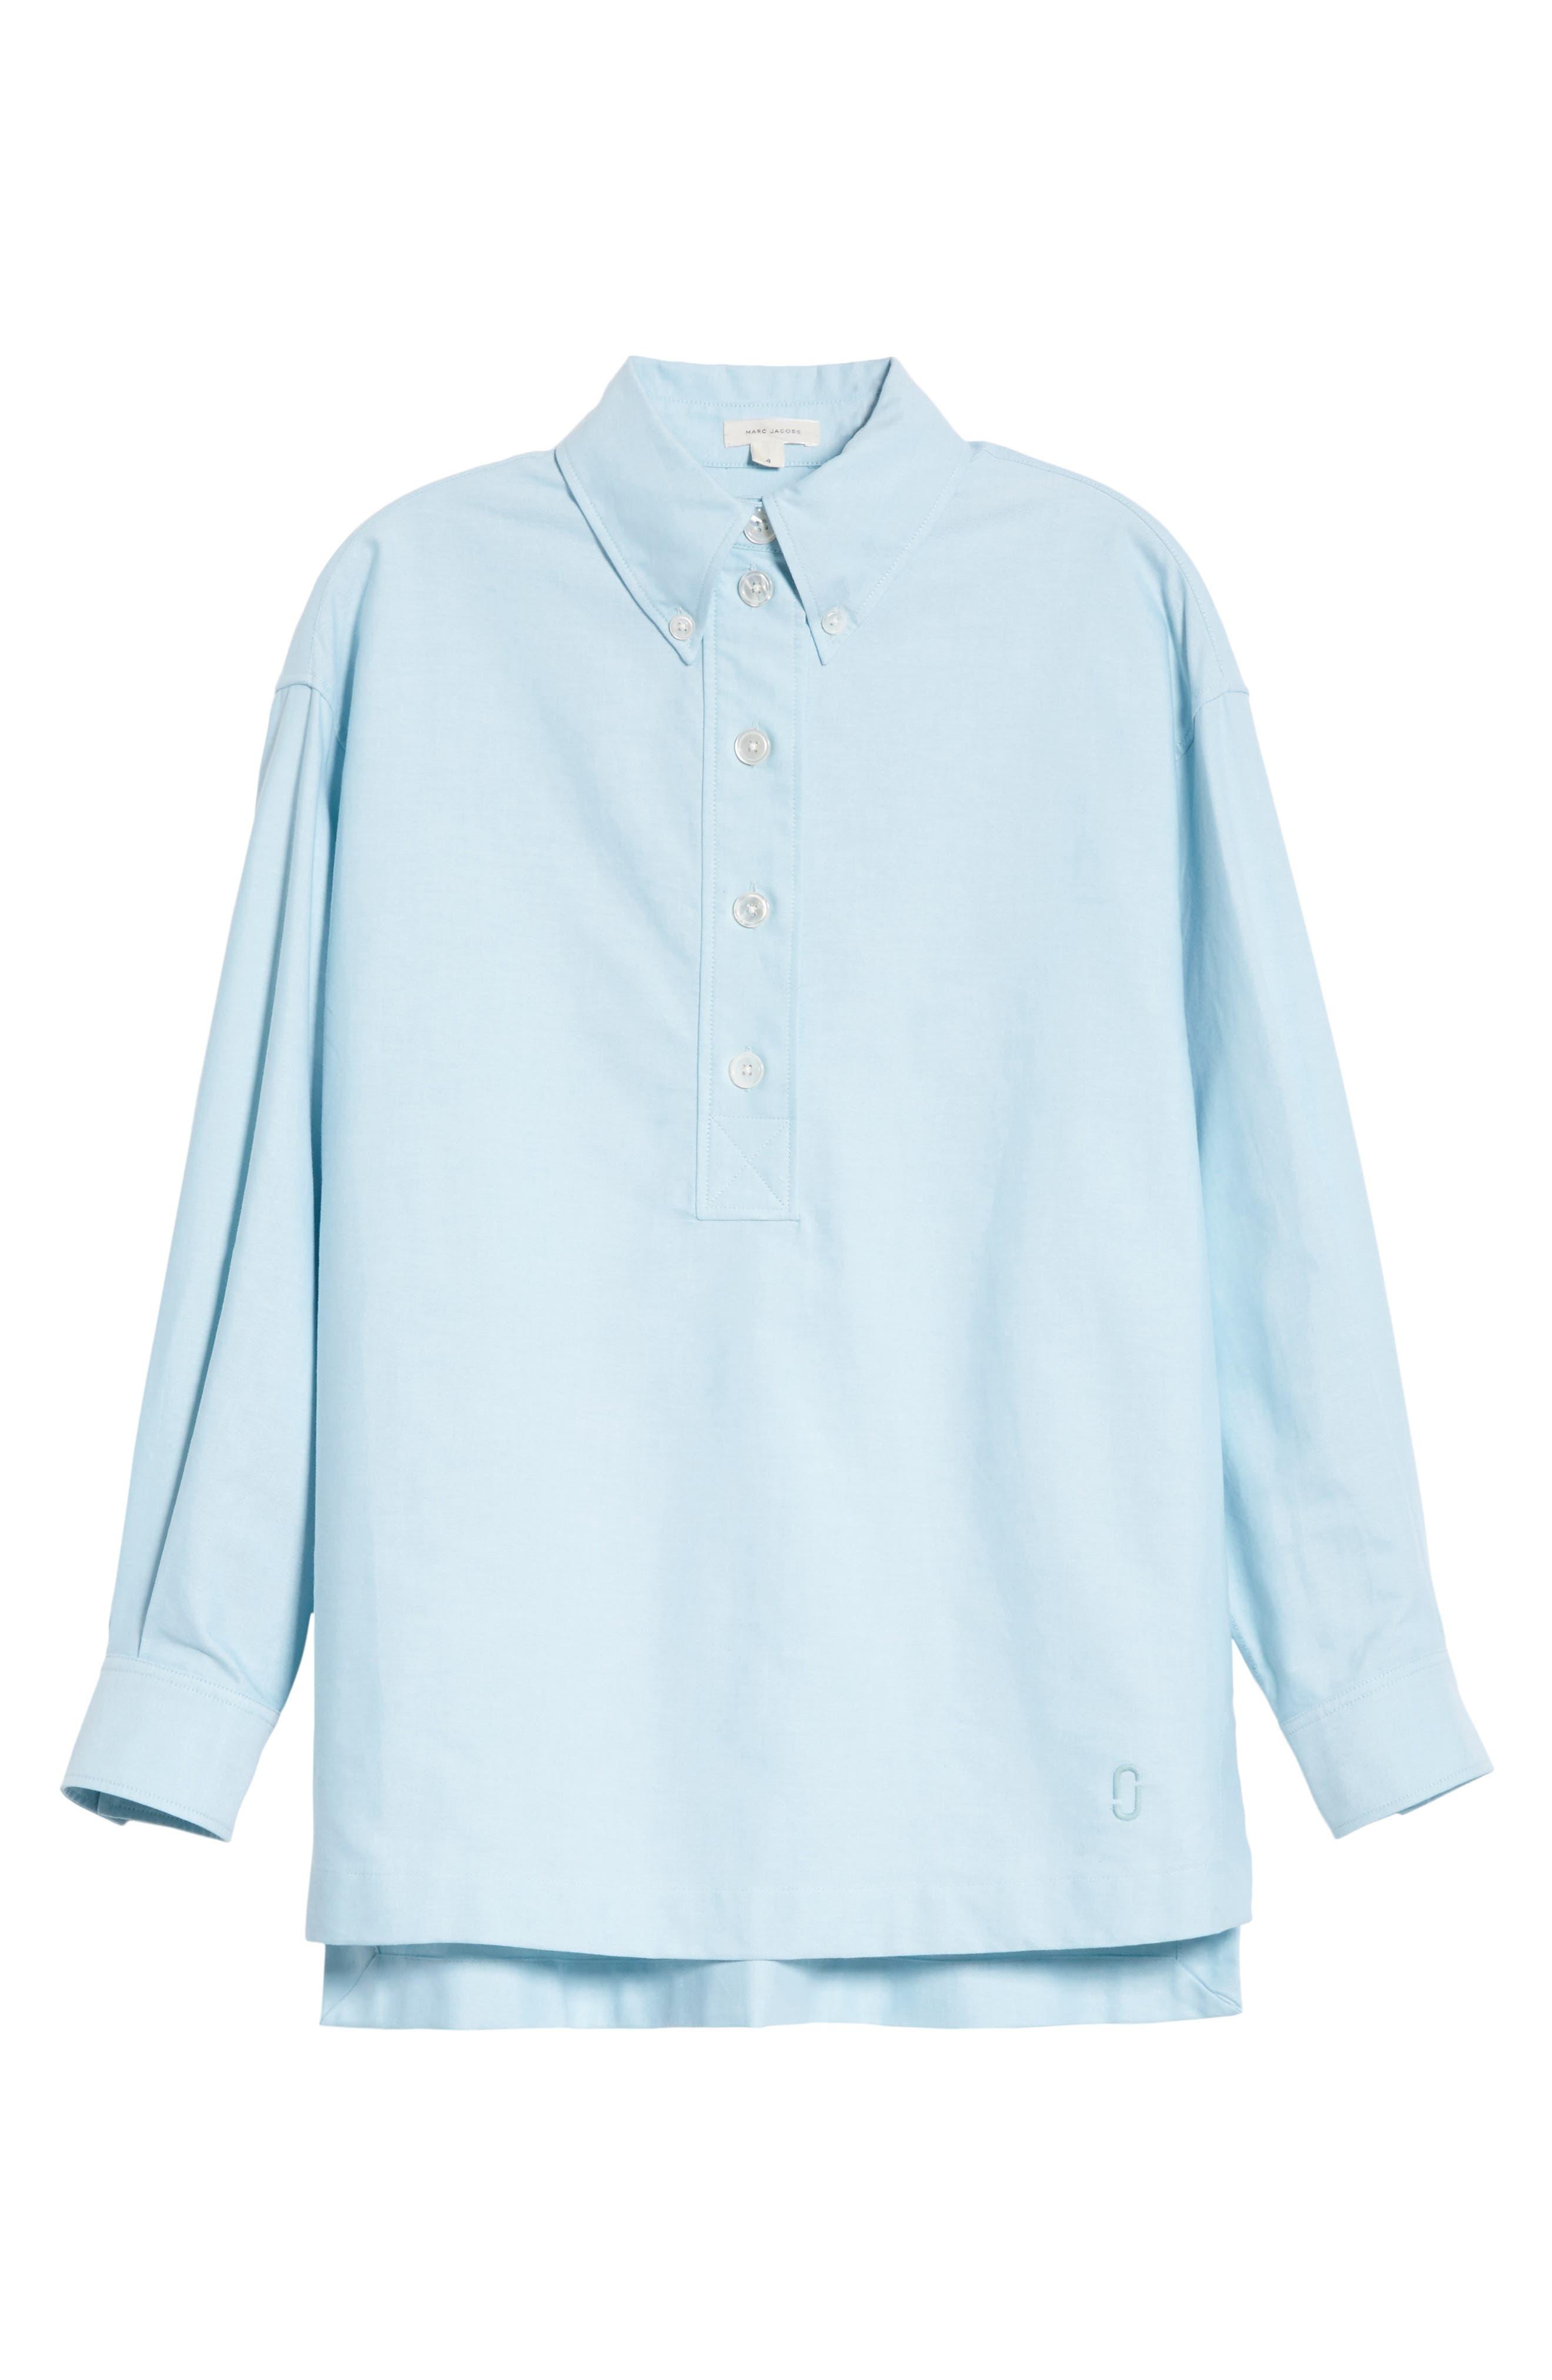 Oversize Half Placket Shirt,                             Alternate thumbnail 6, color,                             Light Turquoise